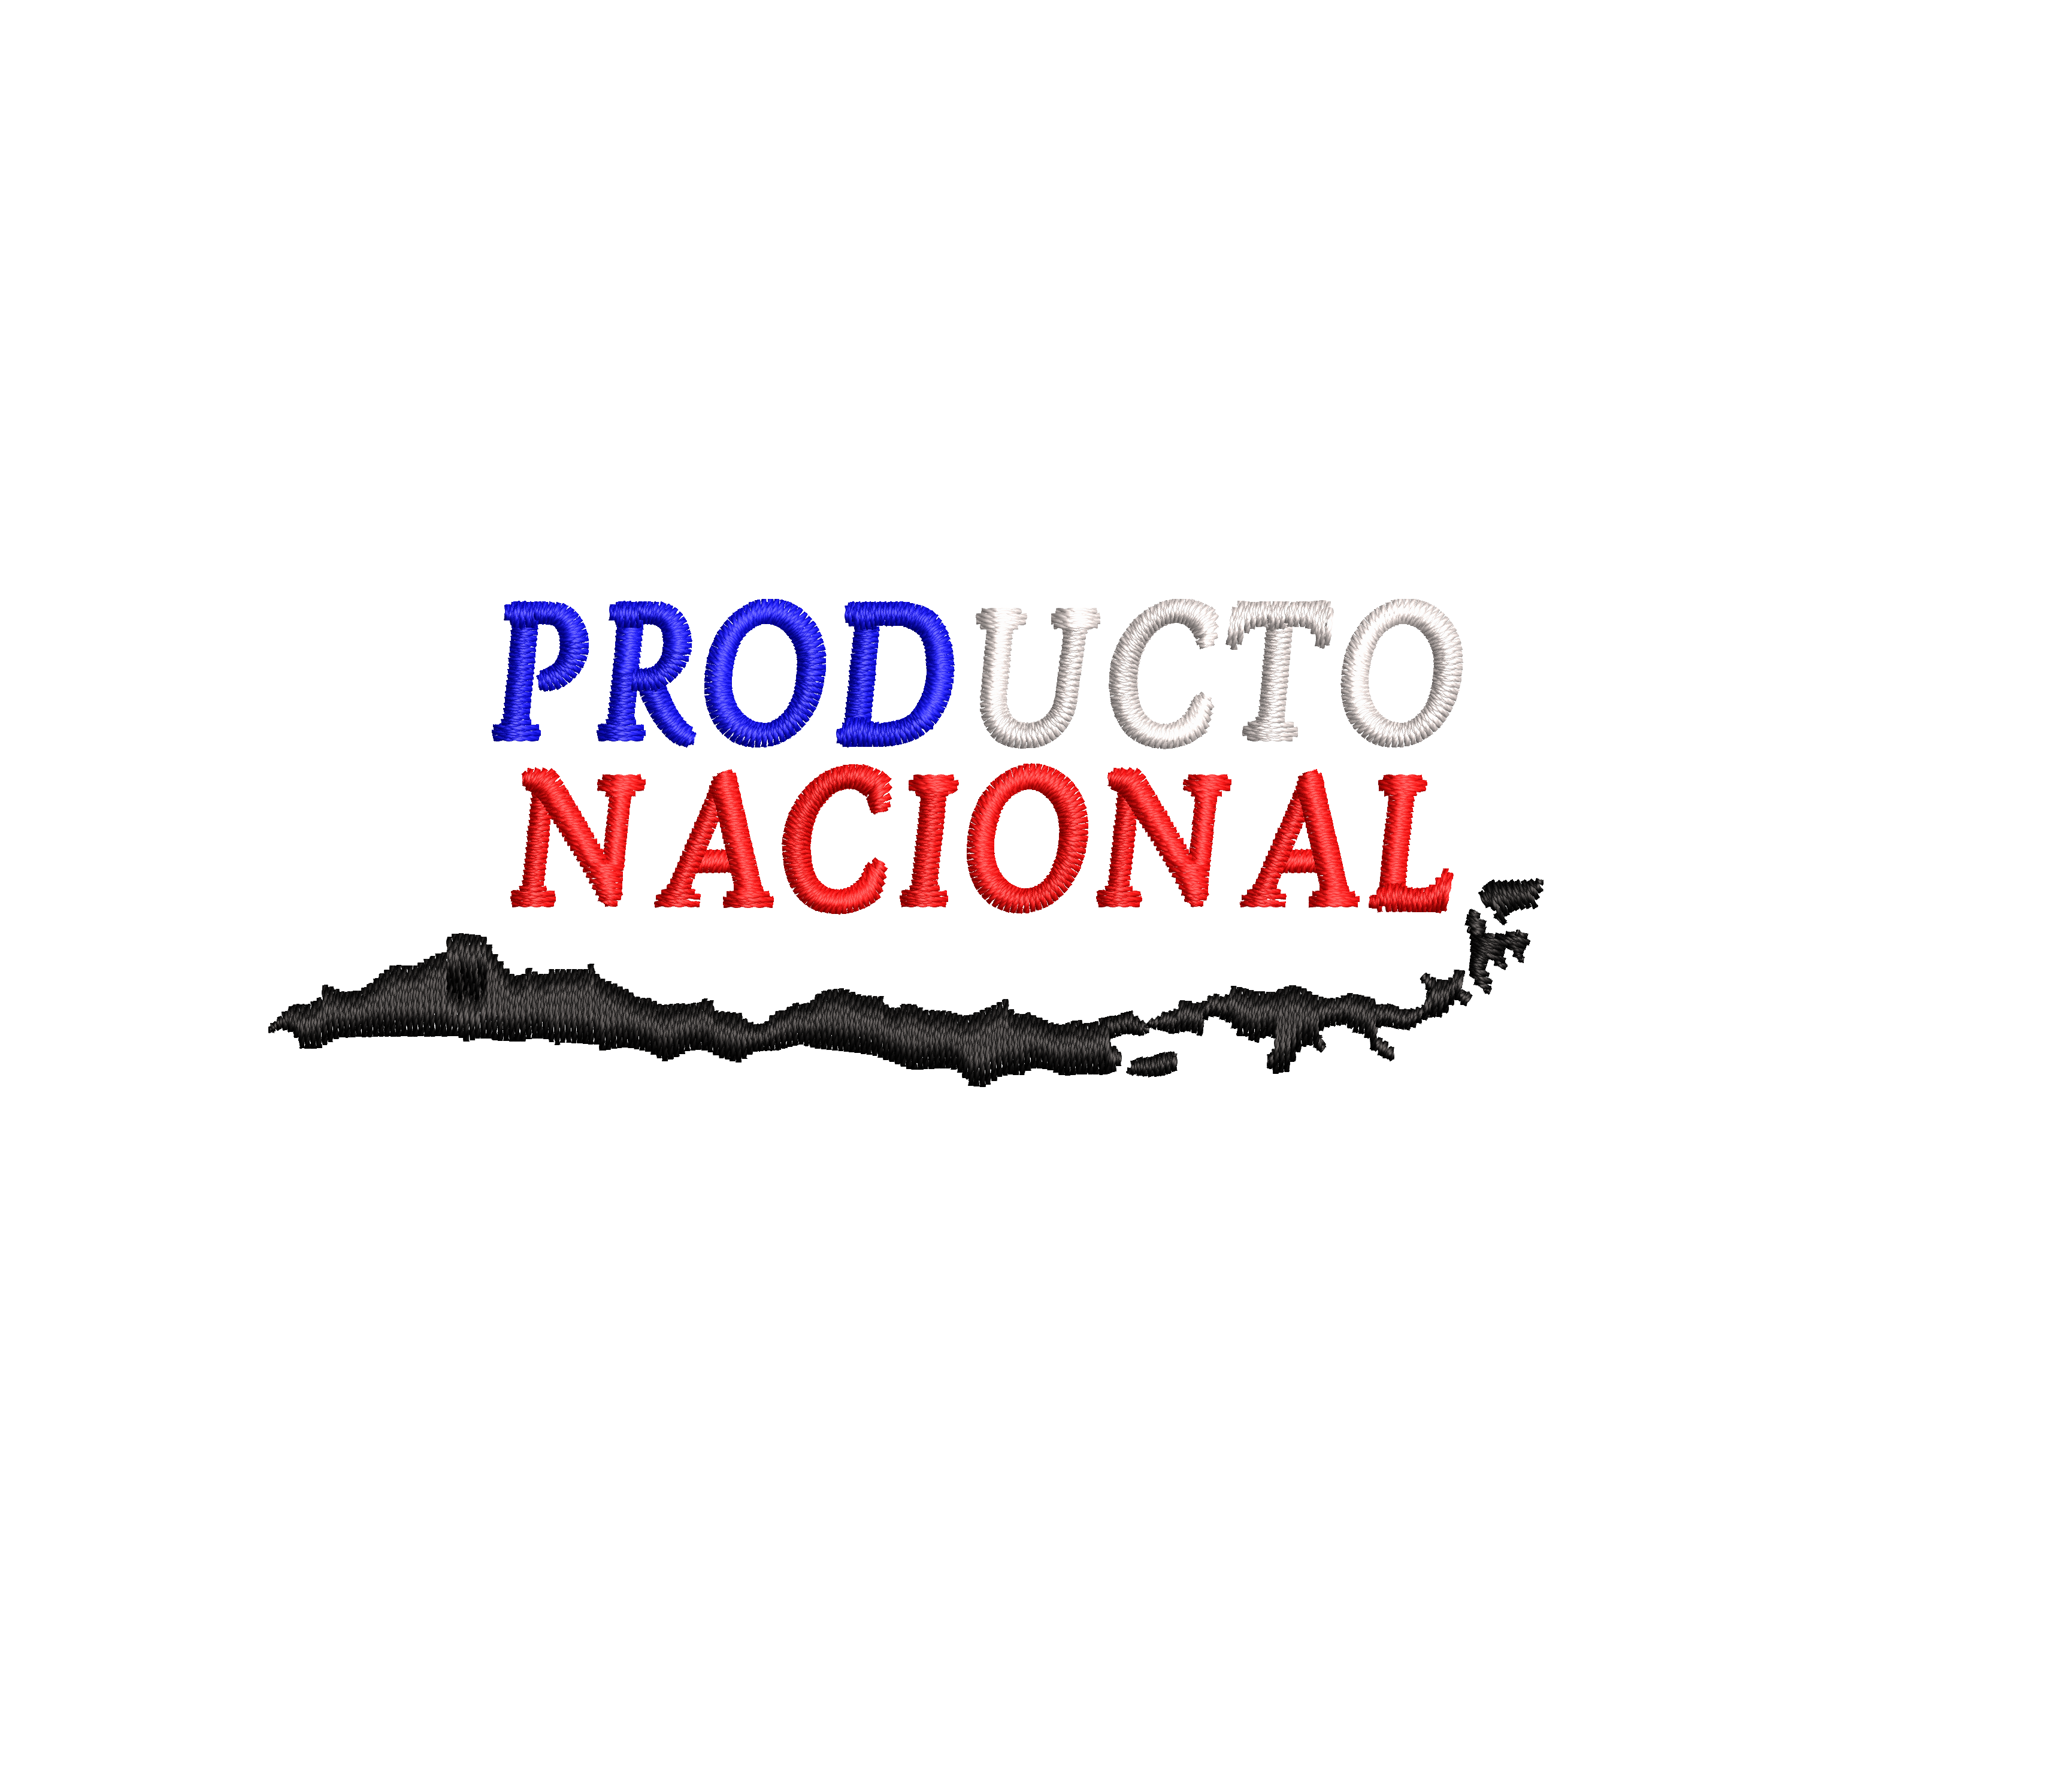 SM41VB - Producto Nacional